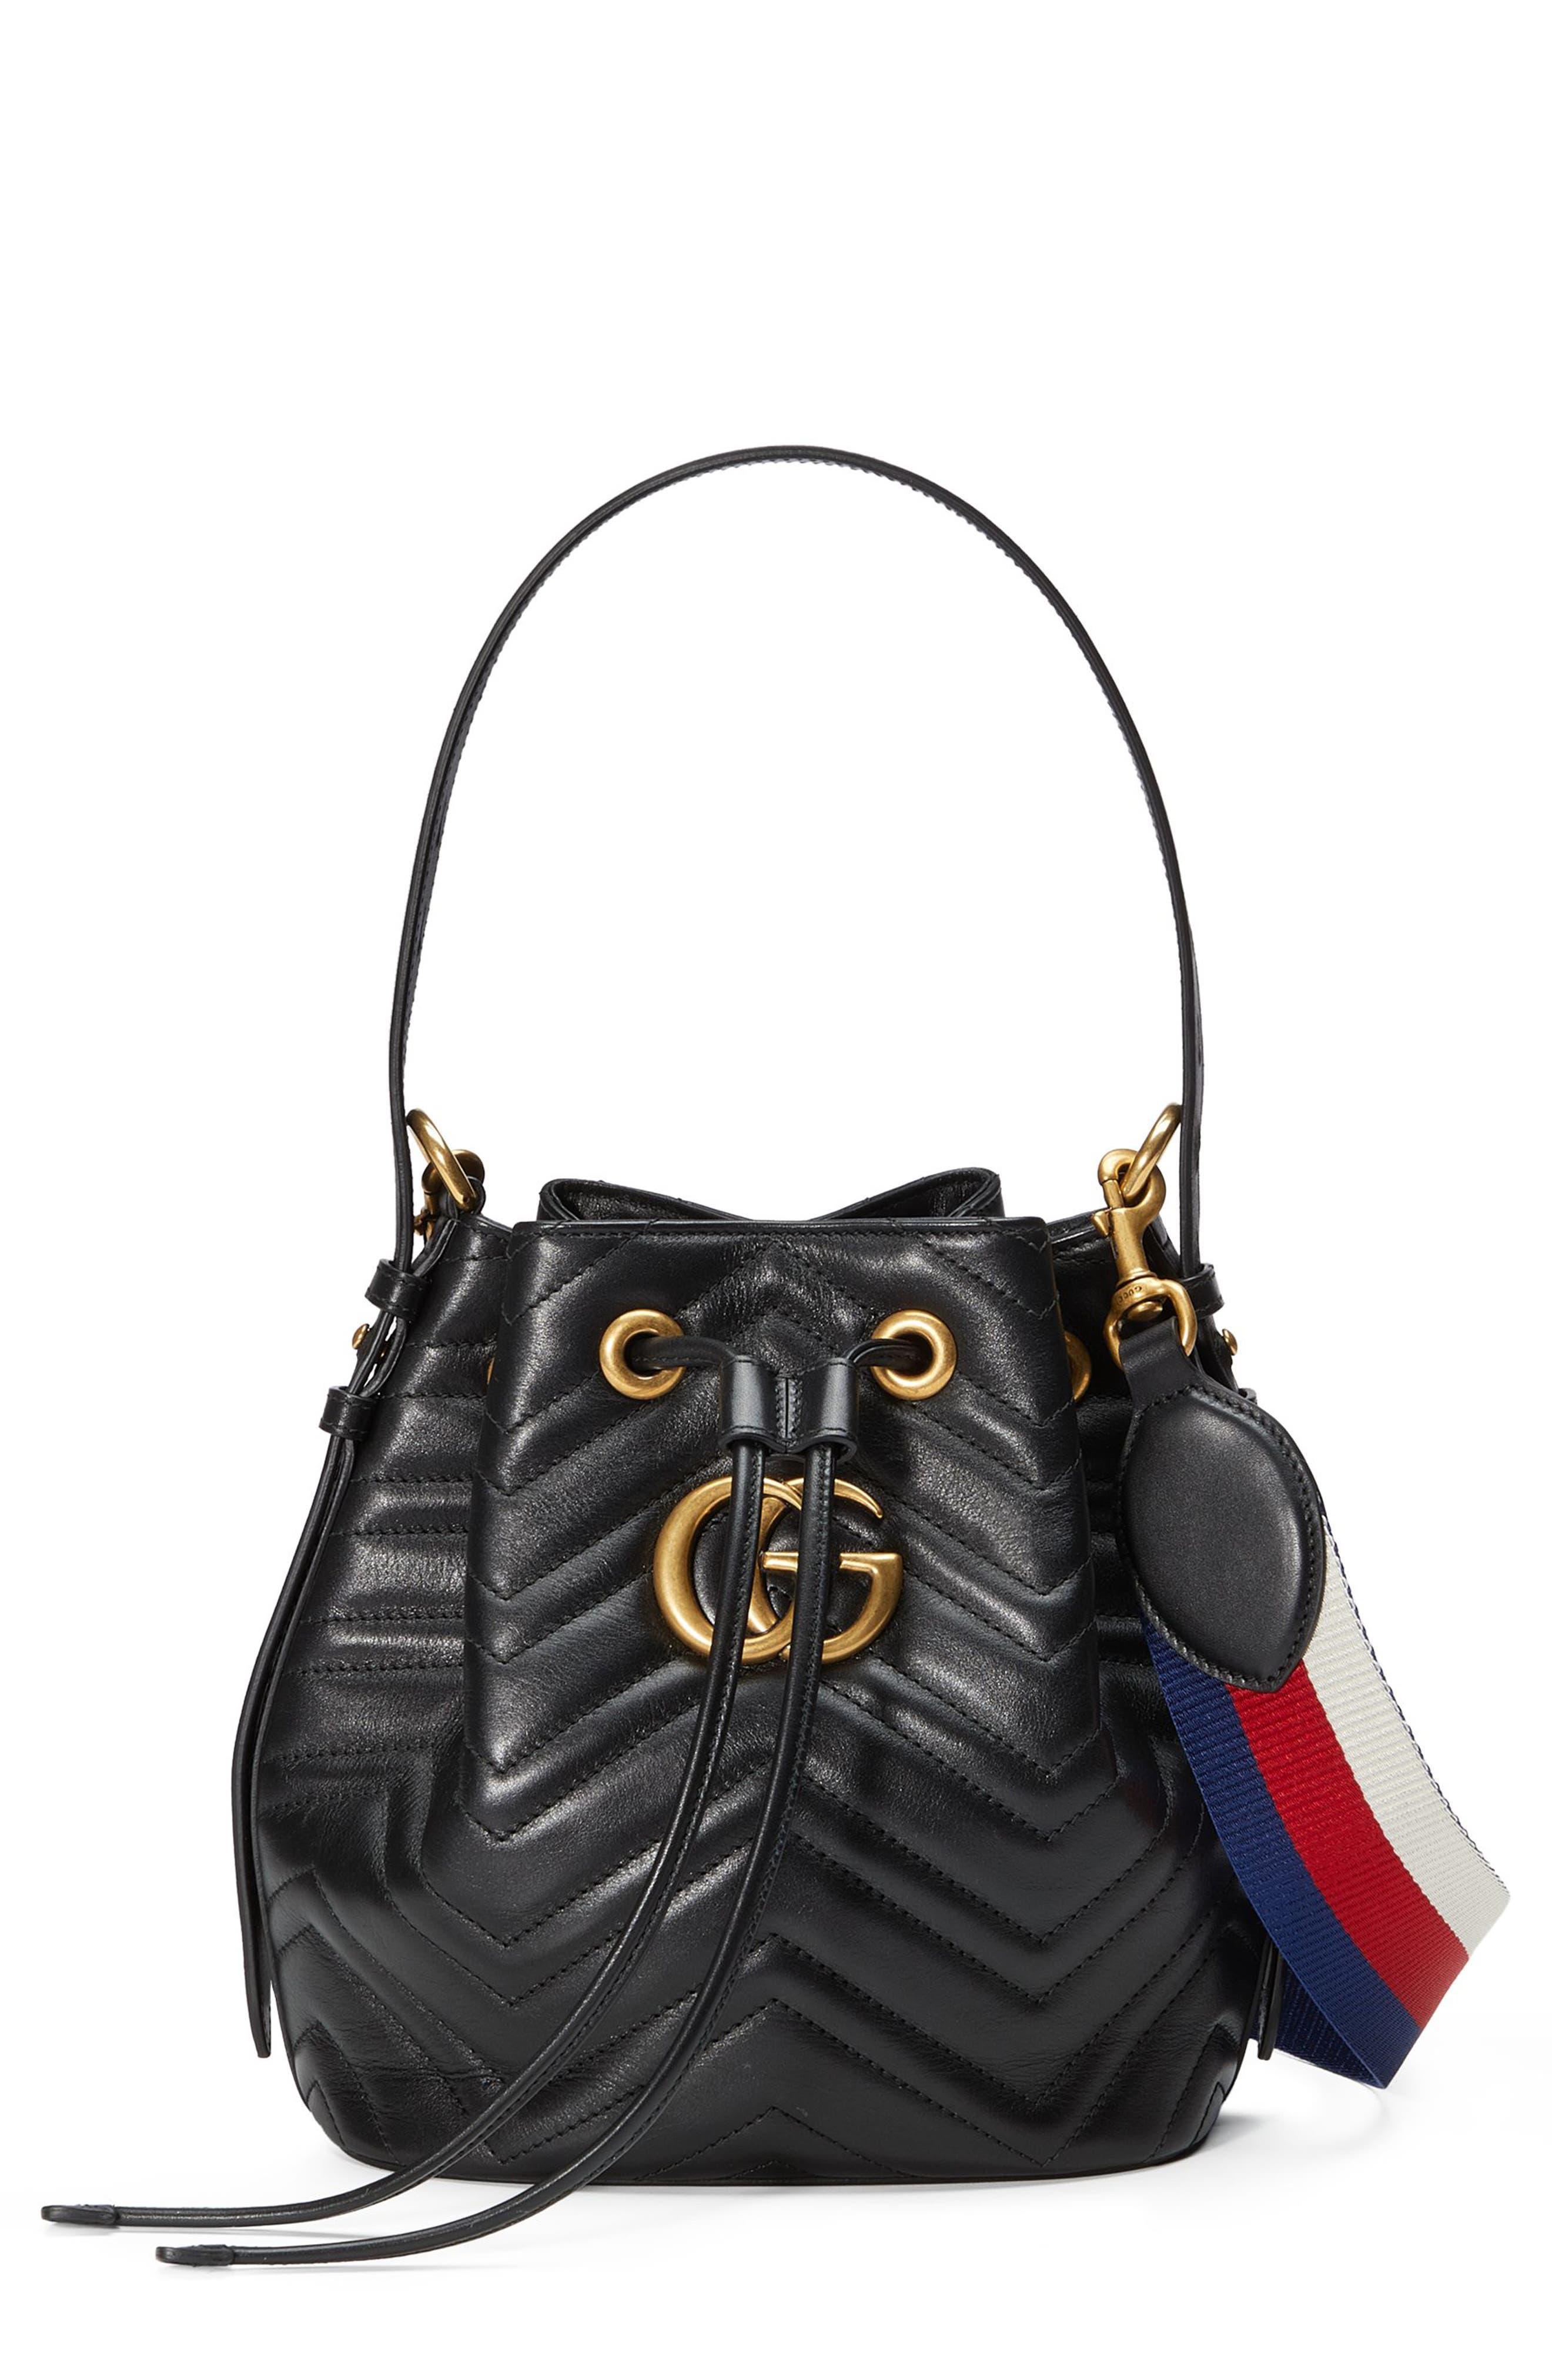 GG Marmont 2.0 Matelassé Leather Bucket Bag,                             Main thumbnail 1, color,                             Nero